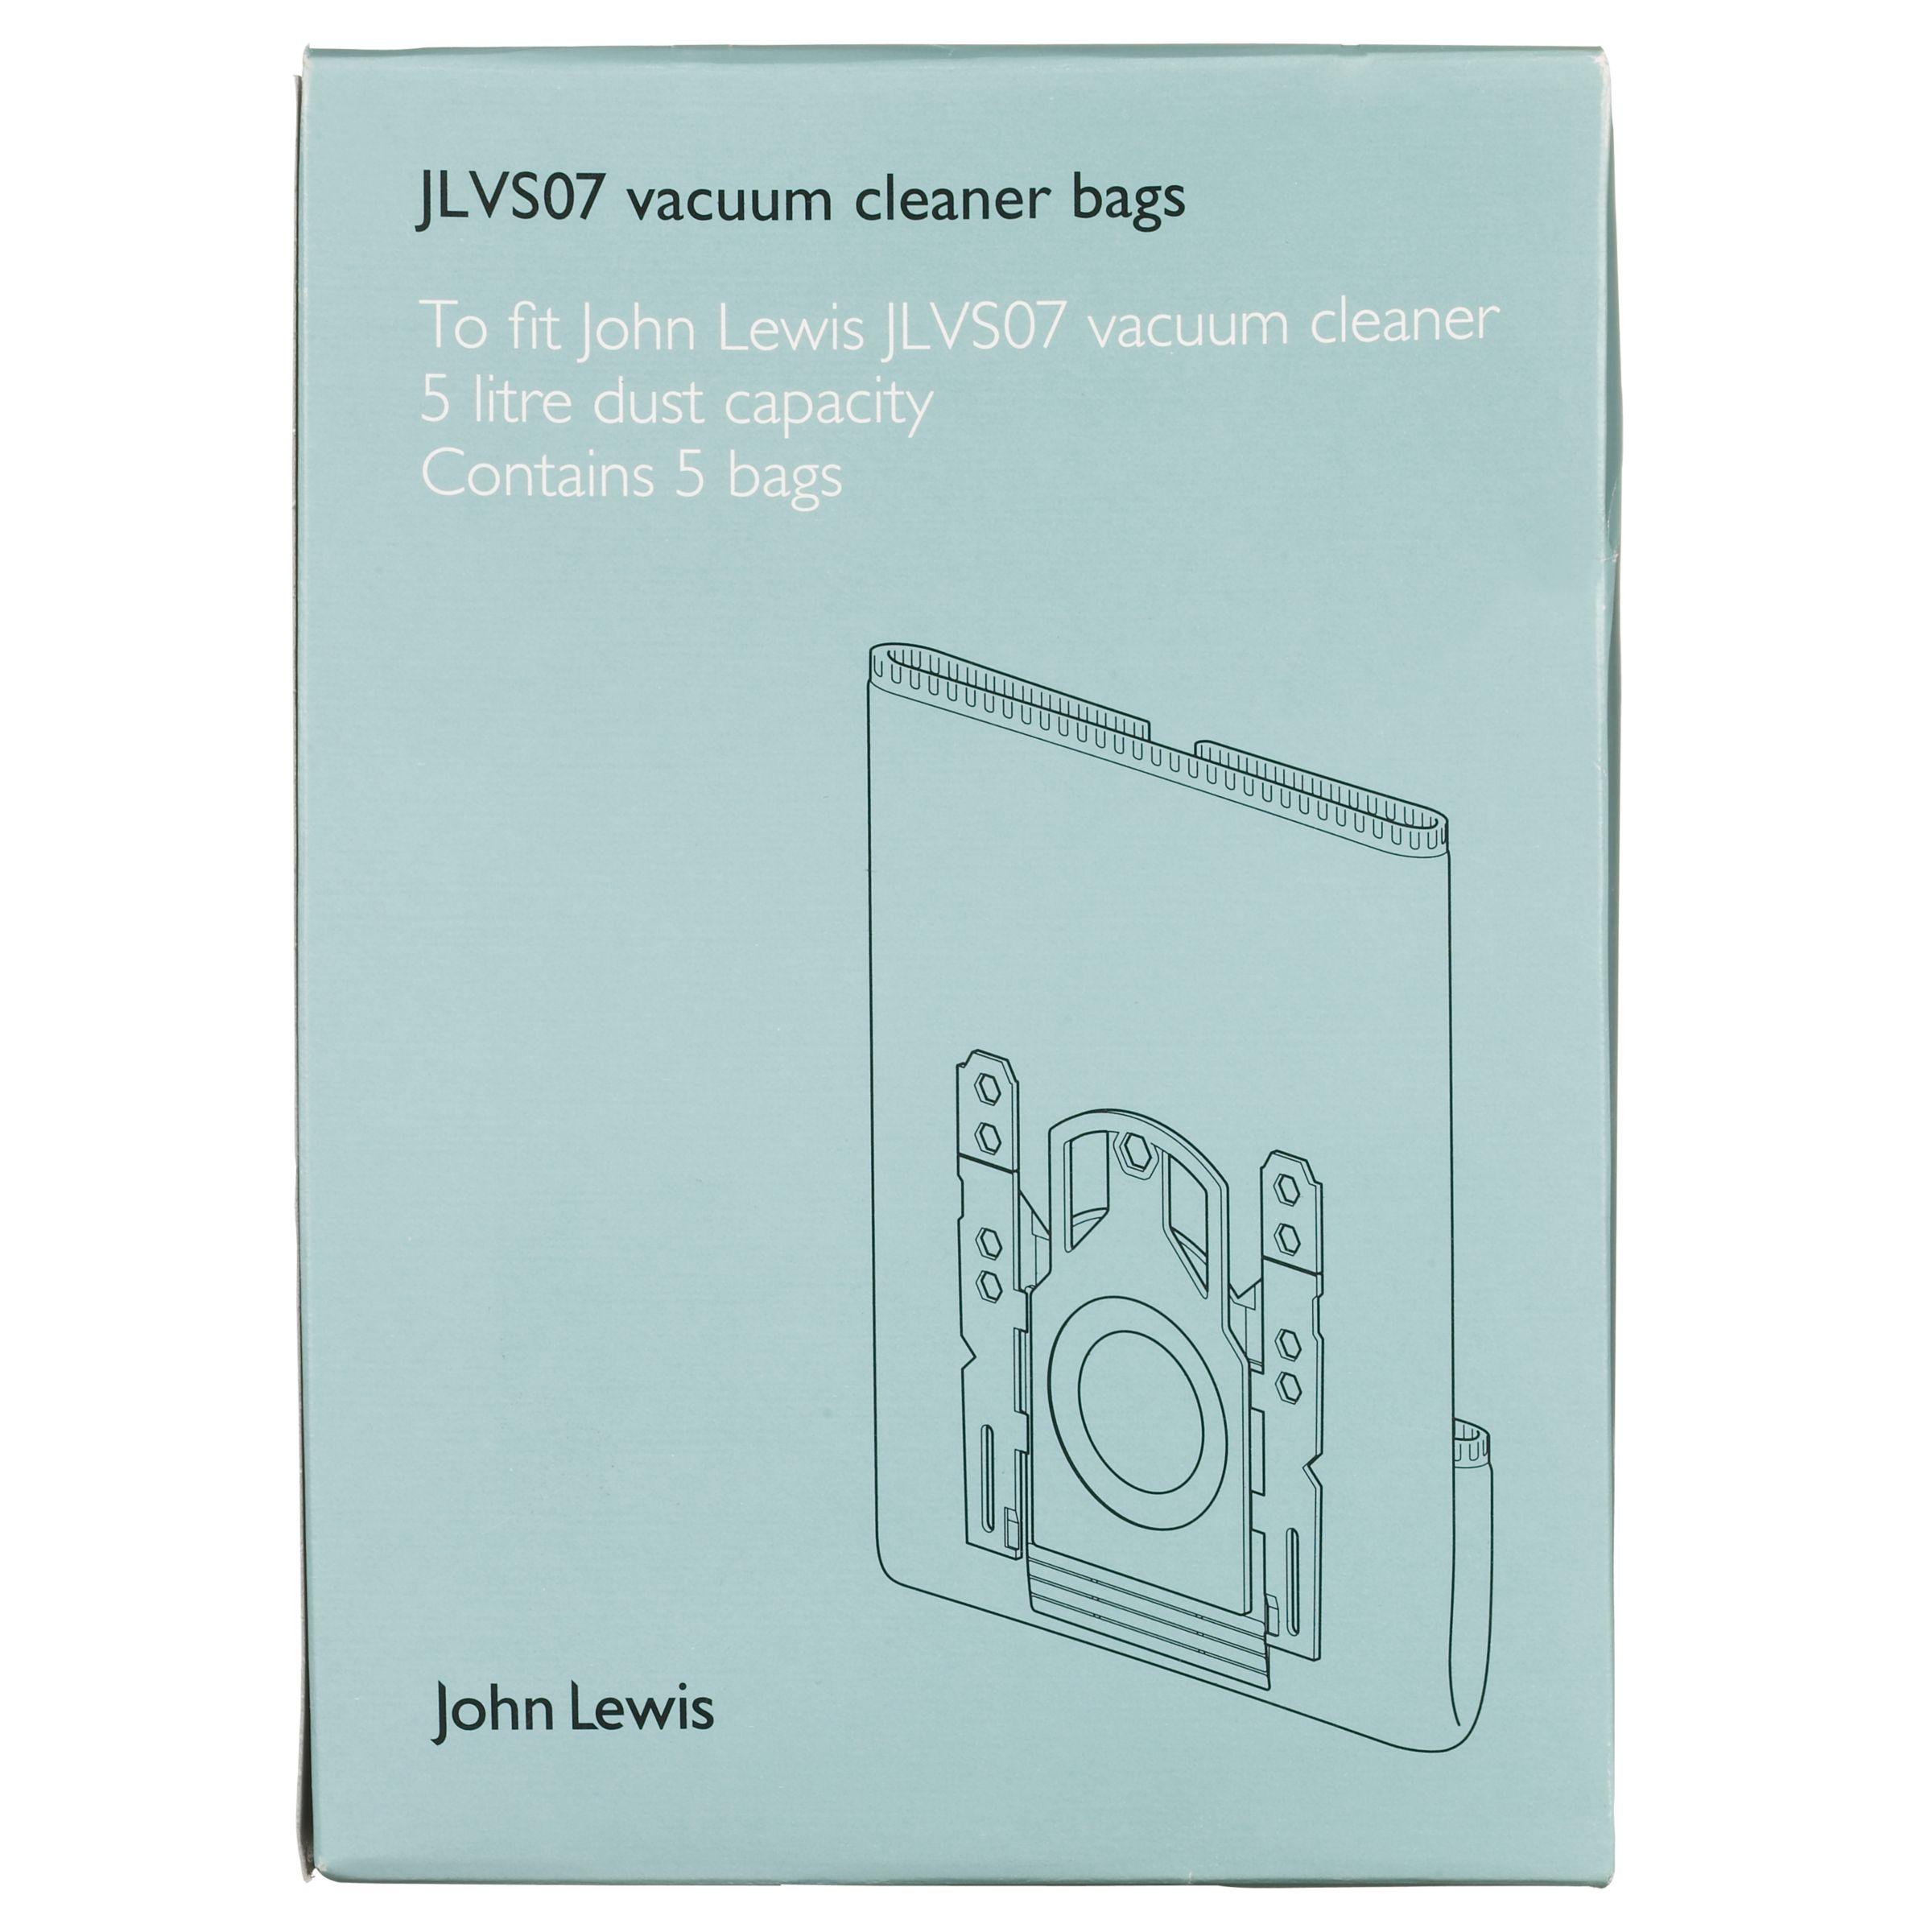 John Lewis Dustbags for VS07 230478829